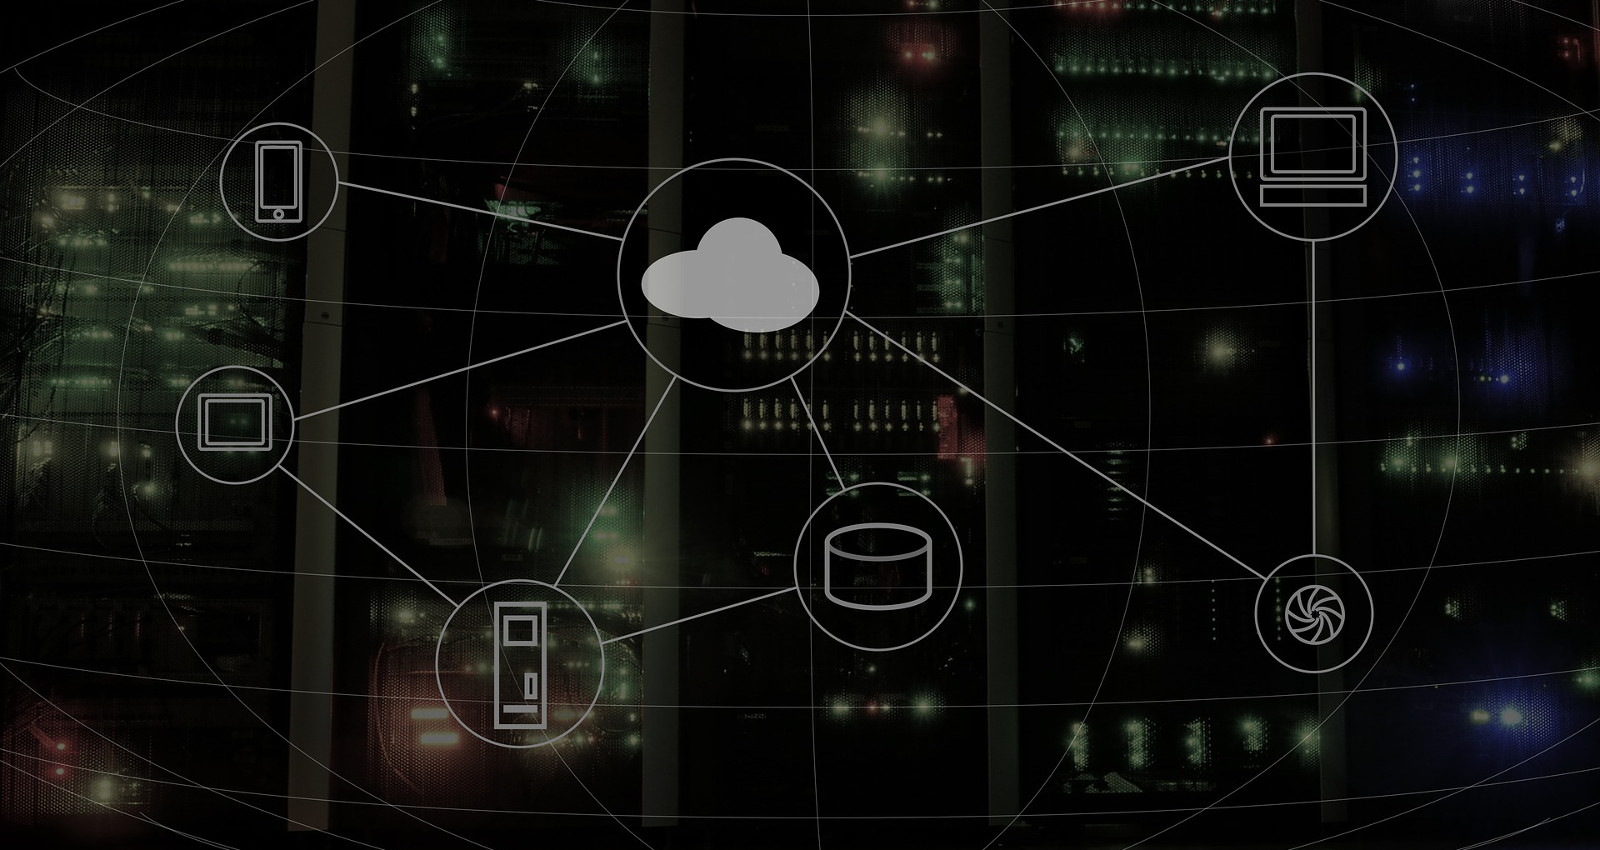 Cloud-Speicher verschlüsseln